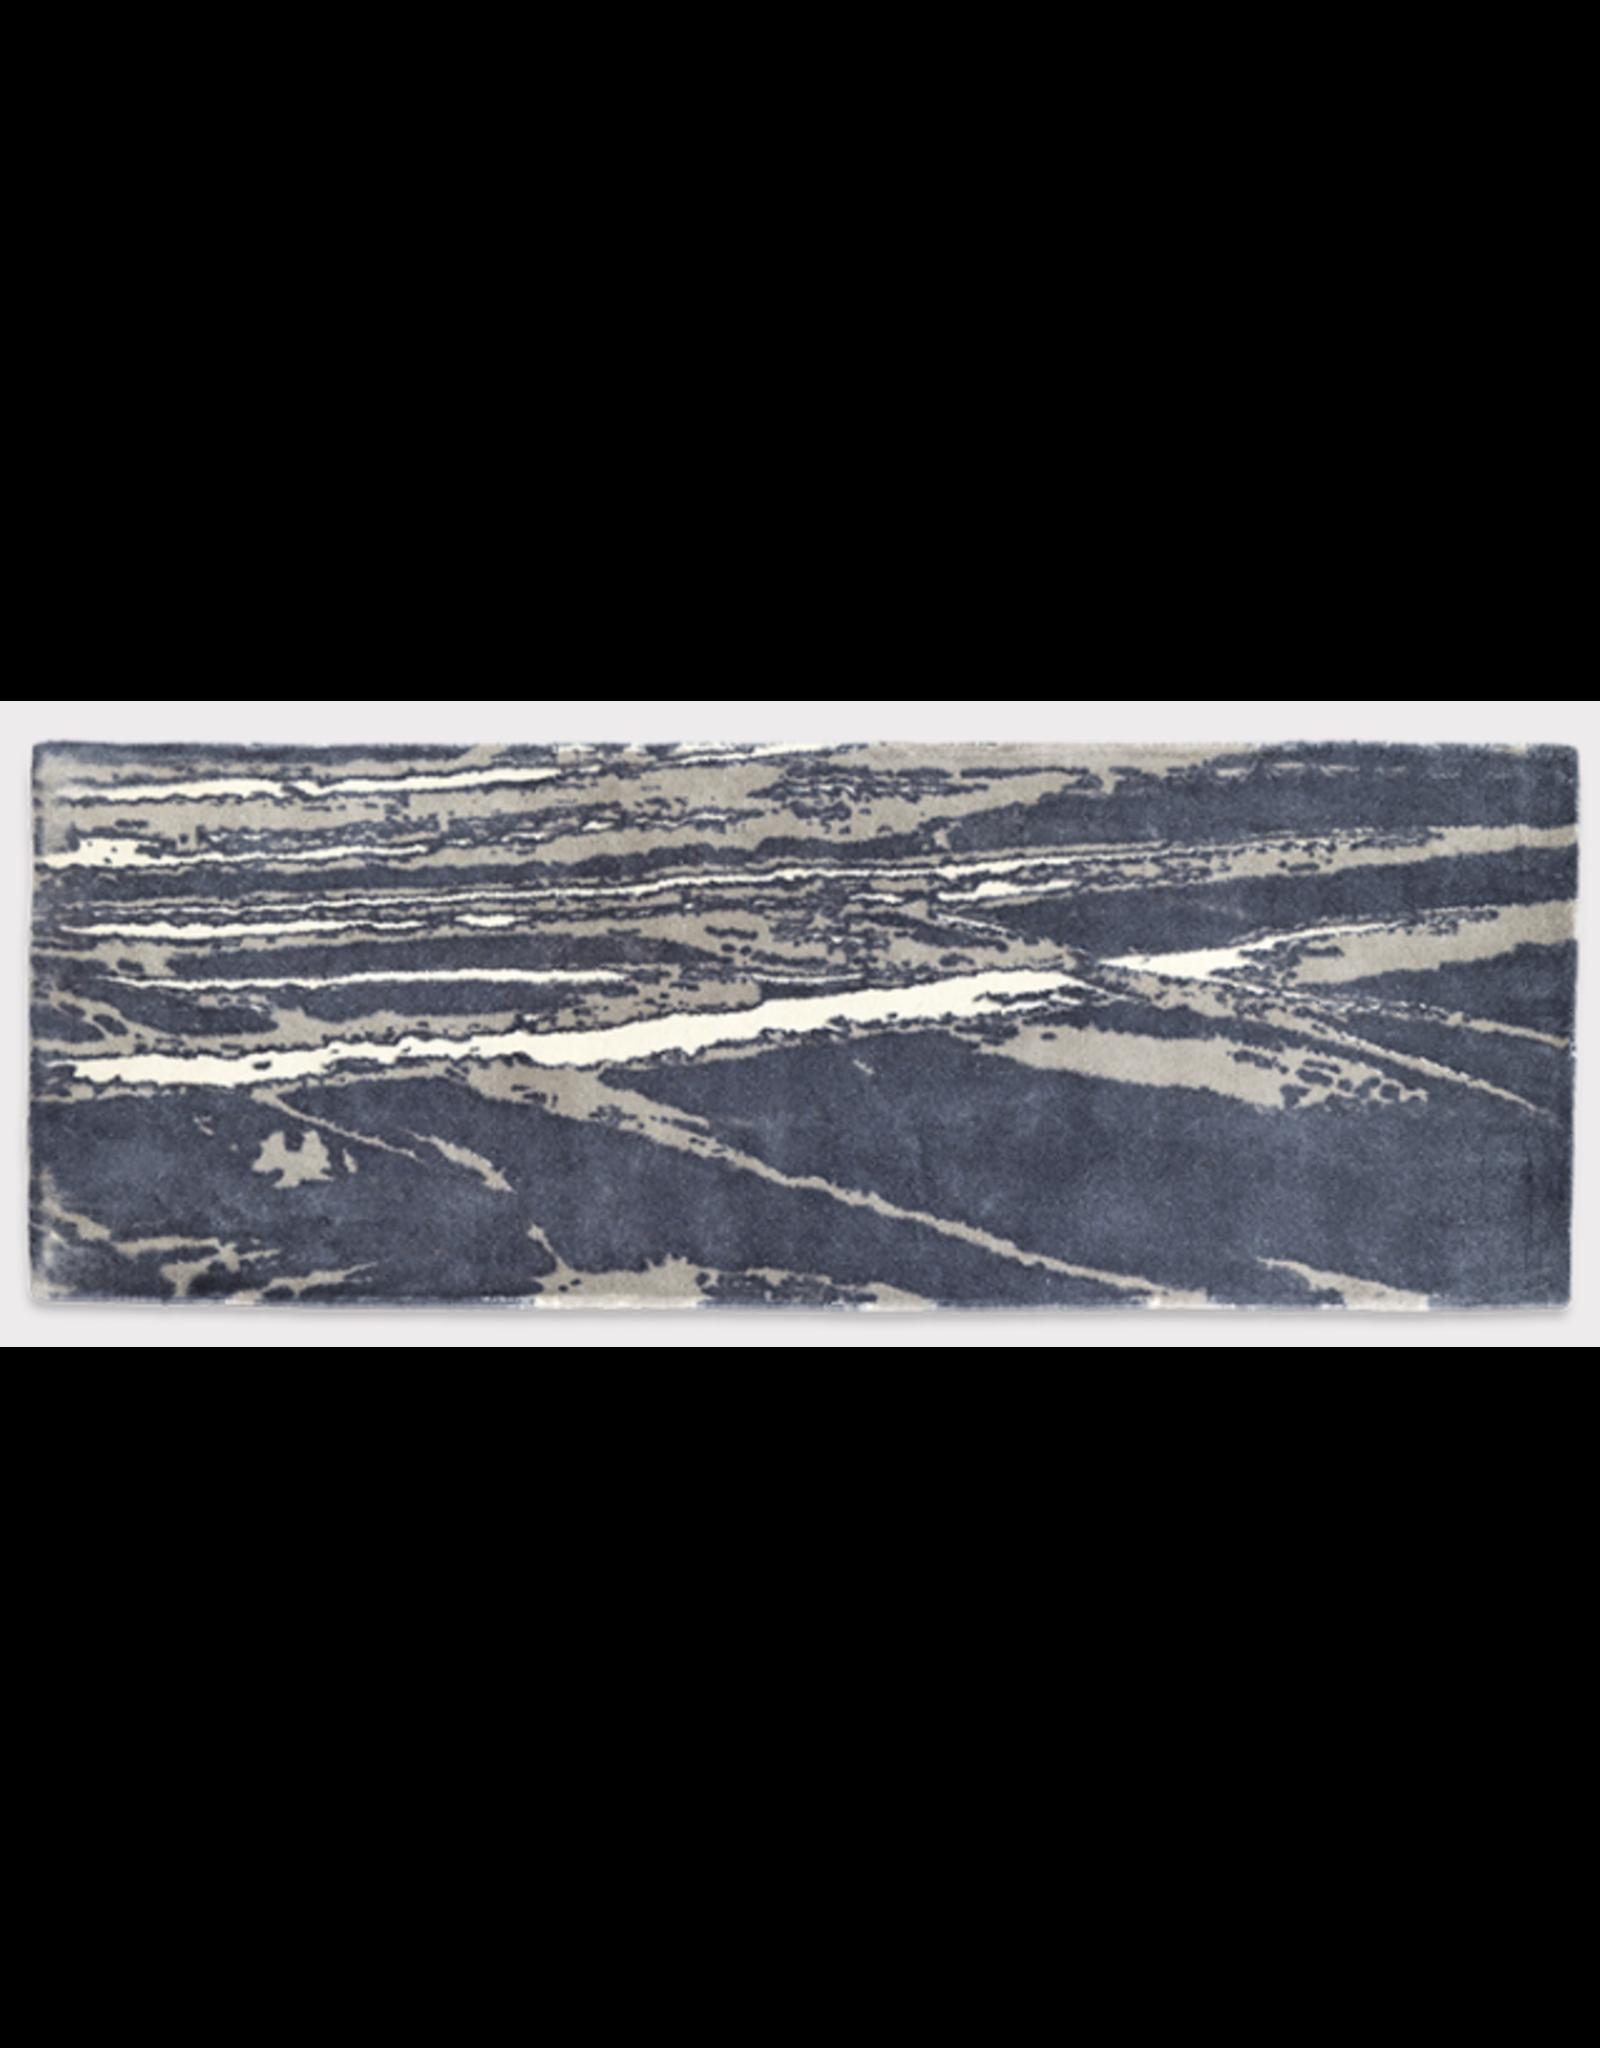 AIR TRAFFIC INFO RUG 深灰色混合地毯